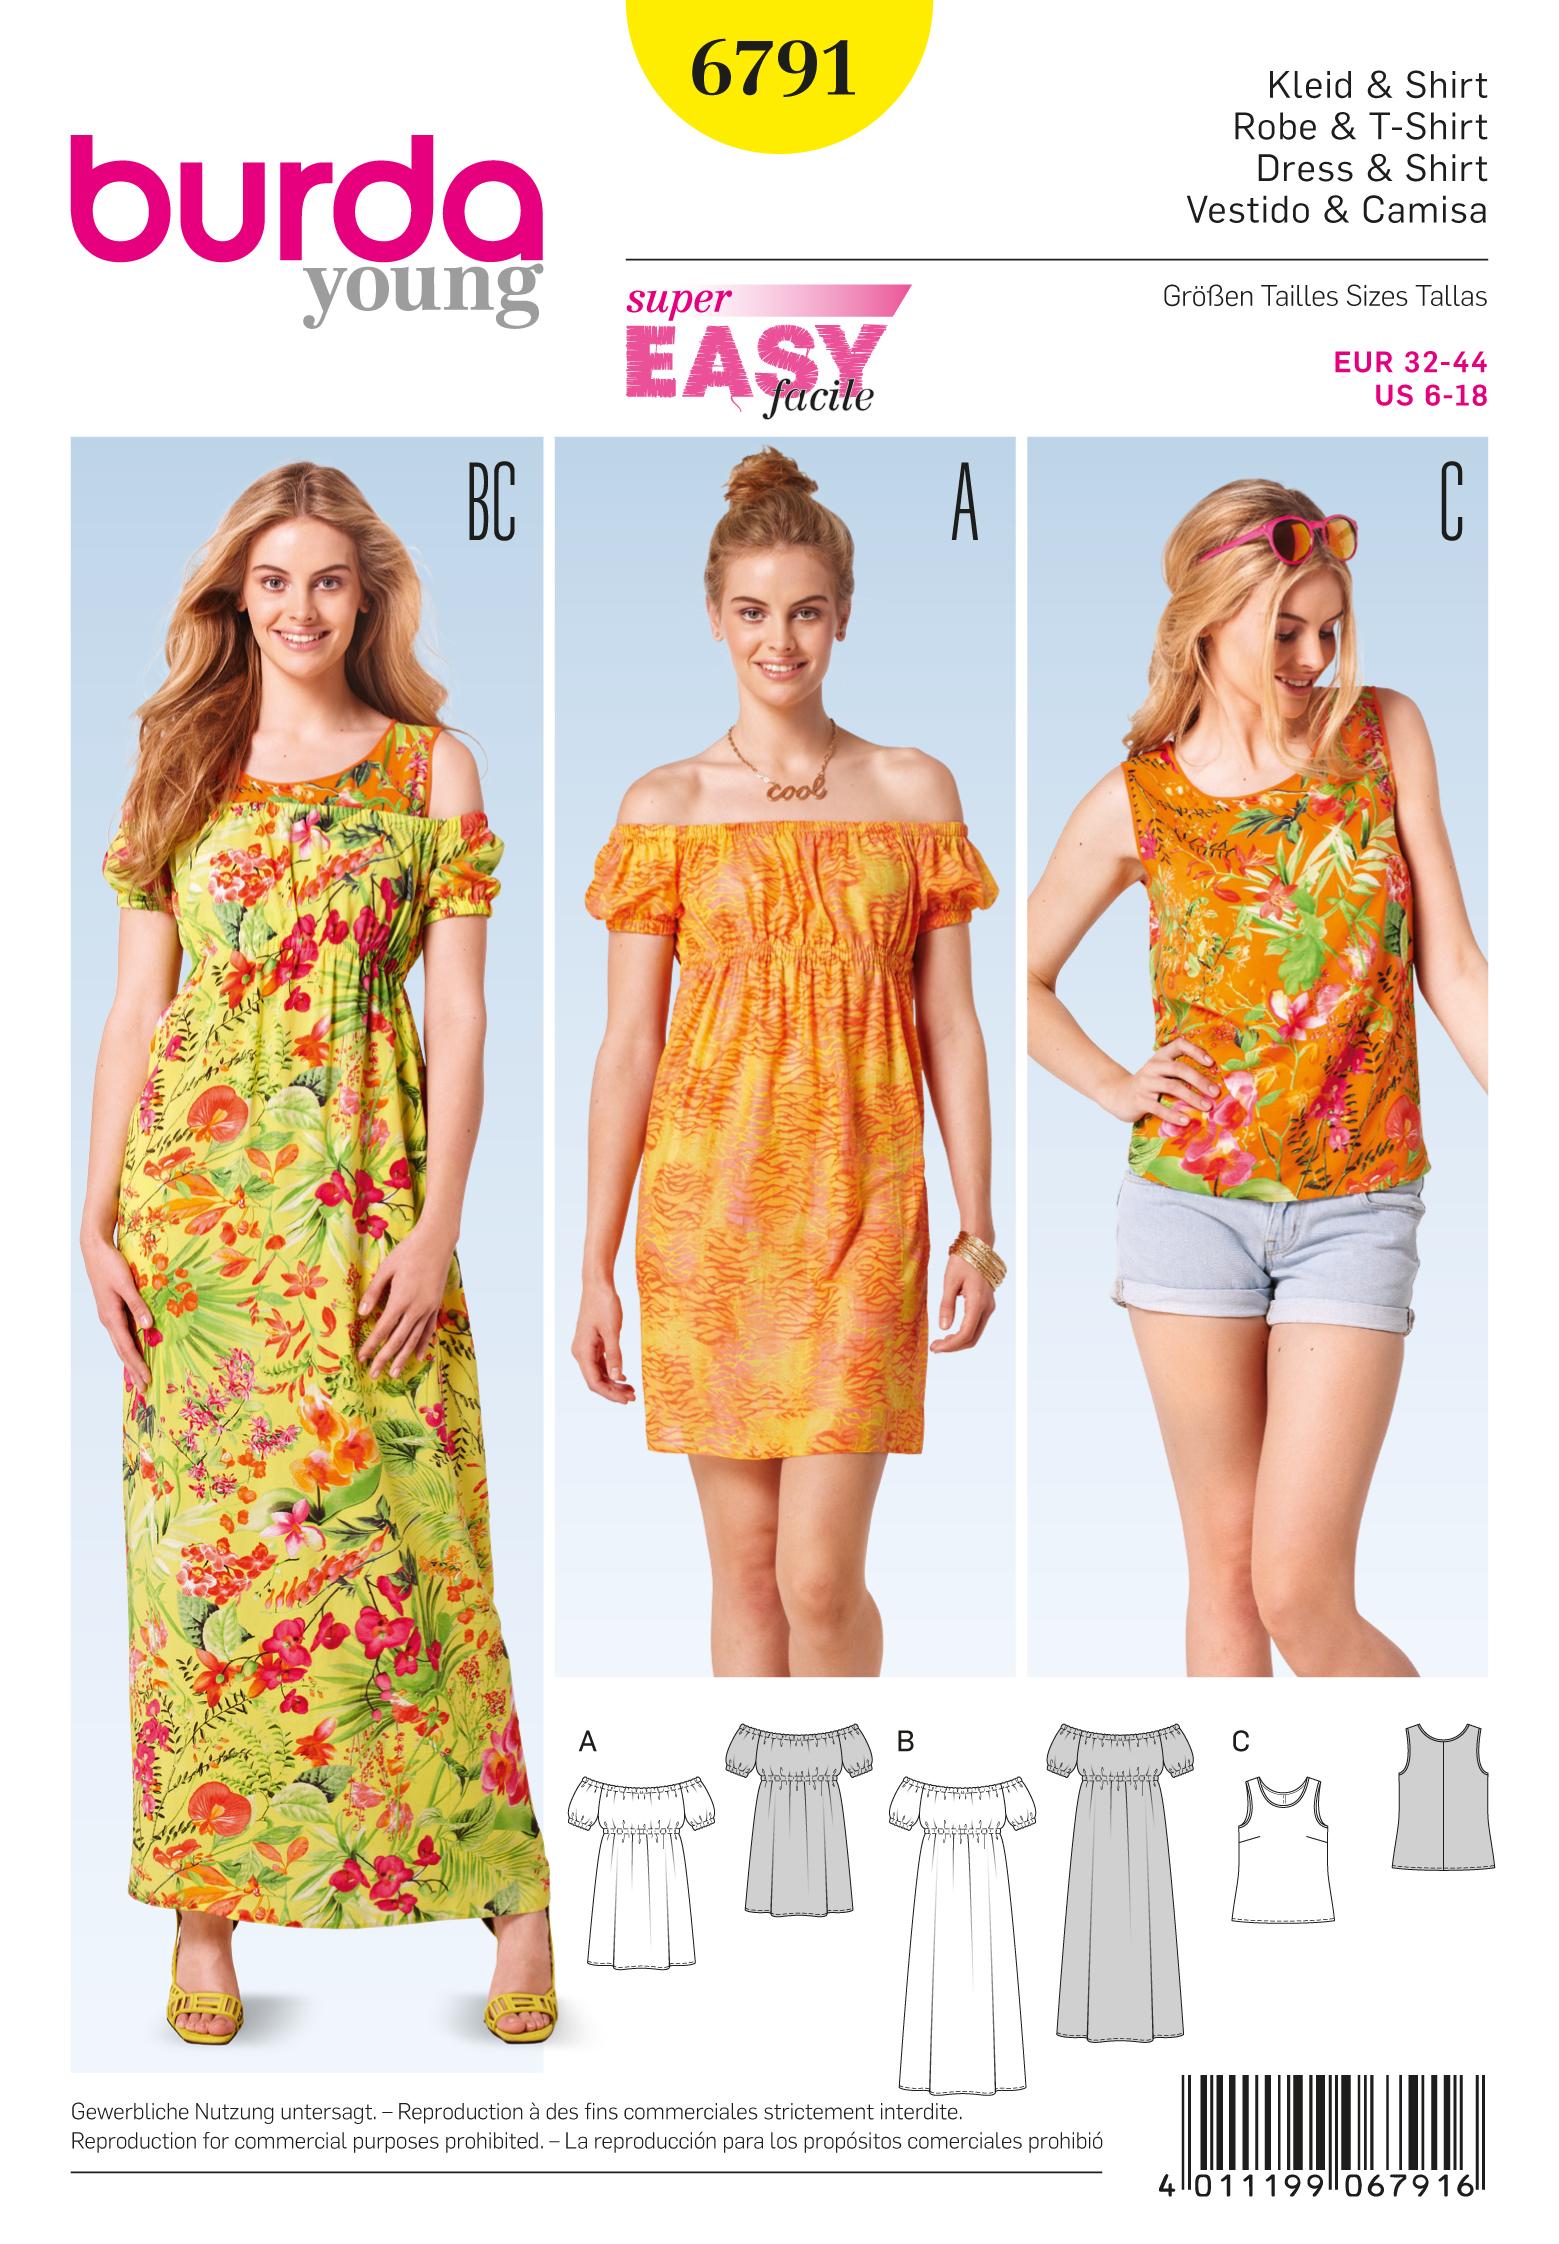 Matching Patterns Burda 6791 Burda Style Dresses